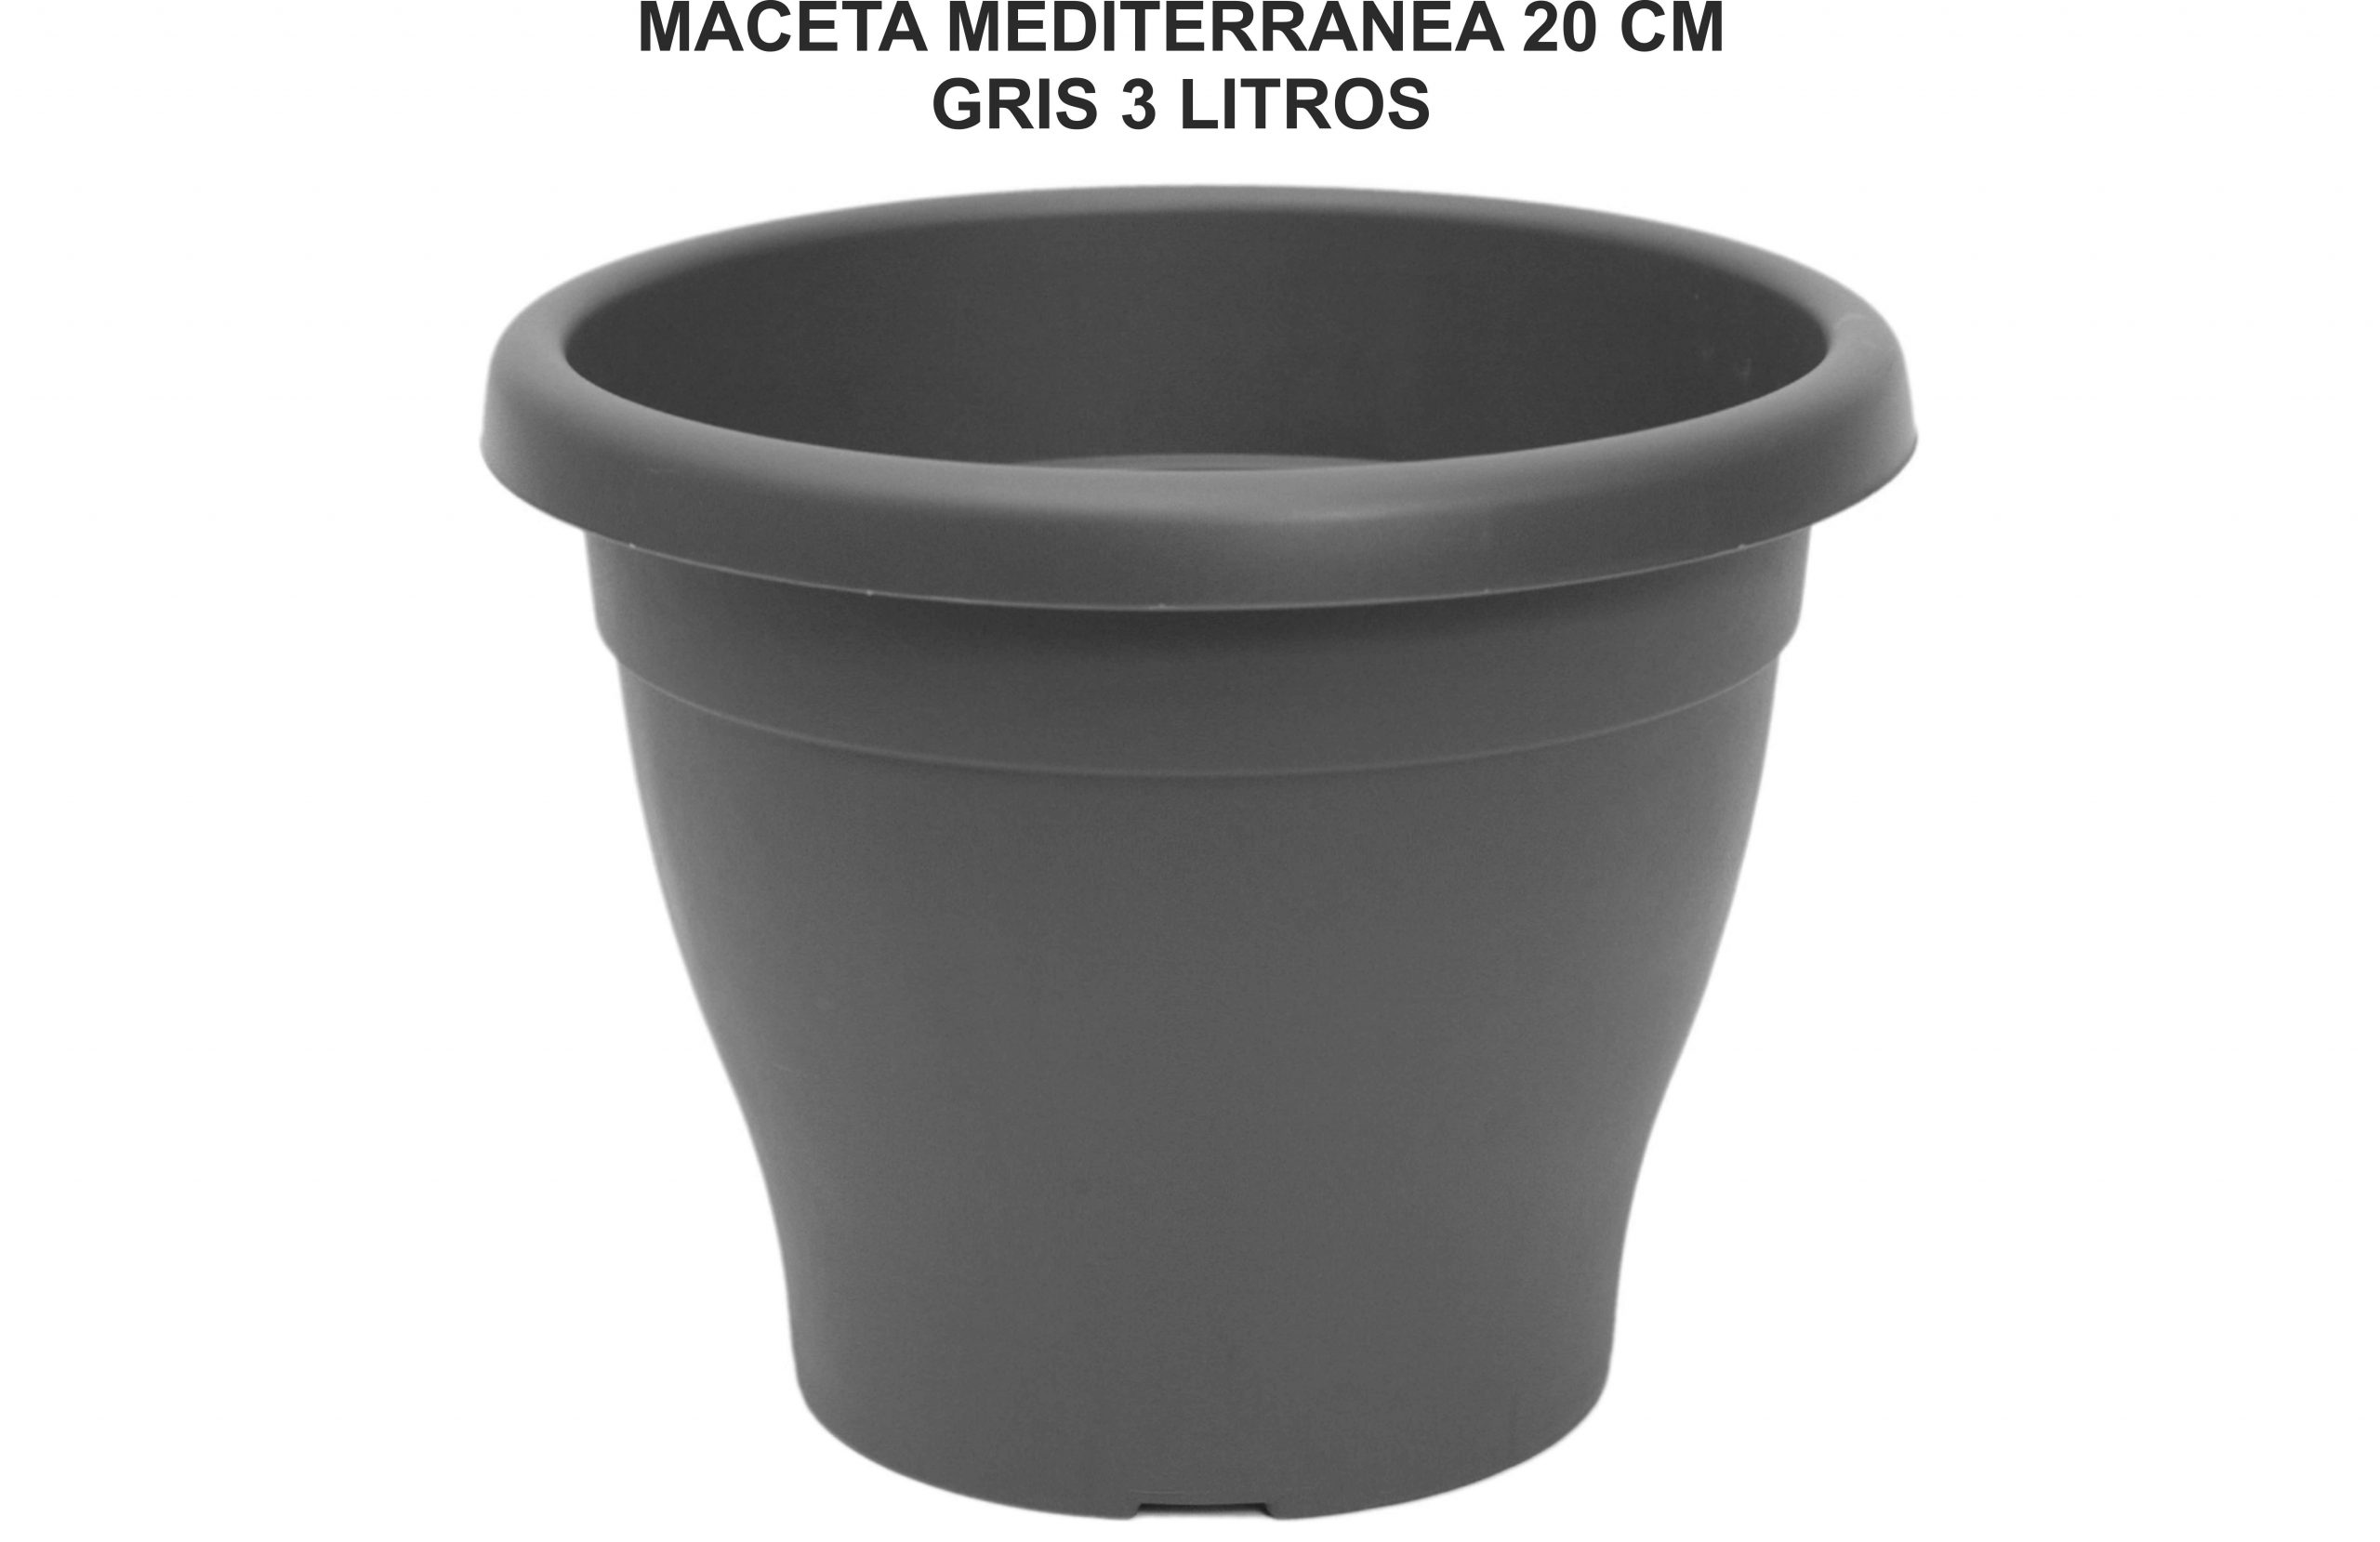 MACETA MEDITERRANEA 20 CM GRIS